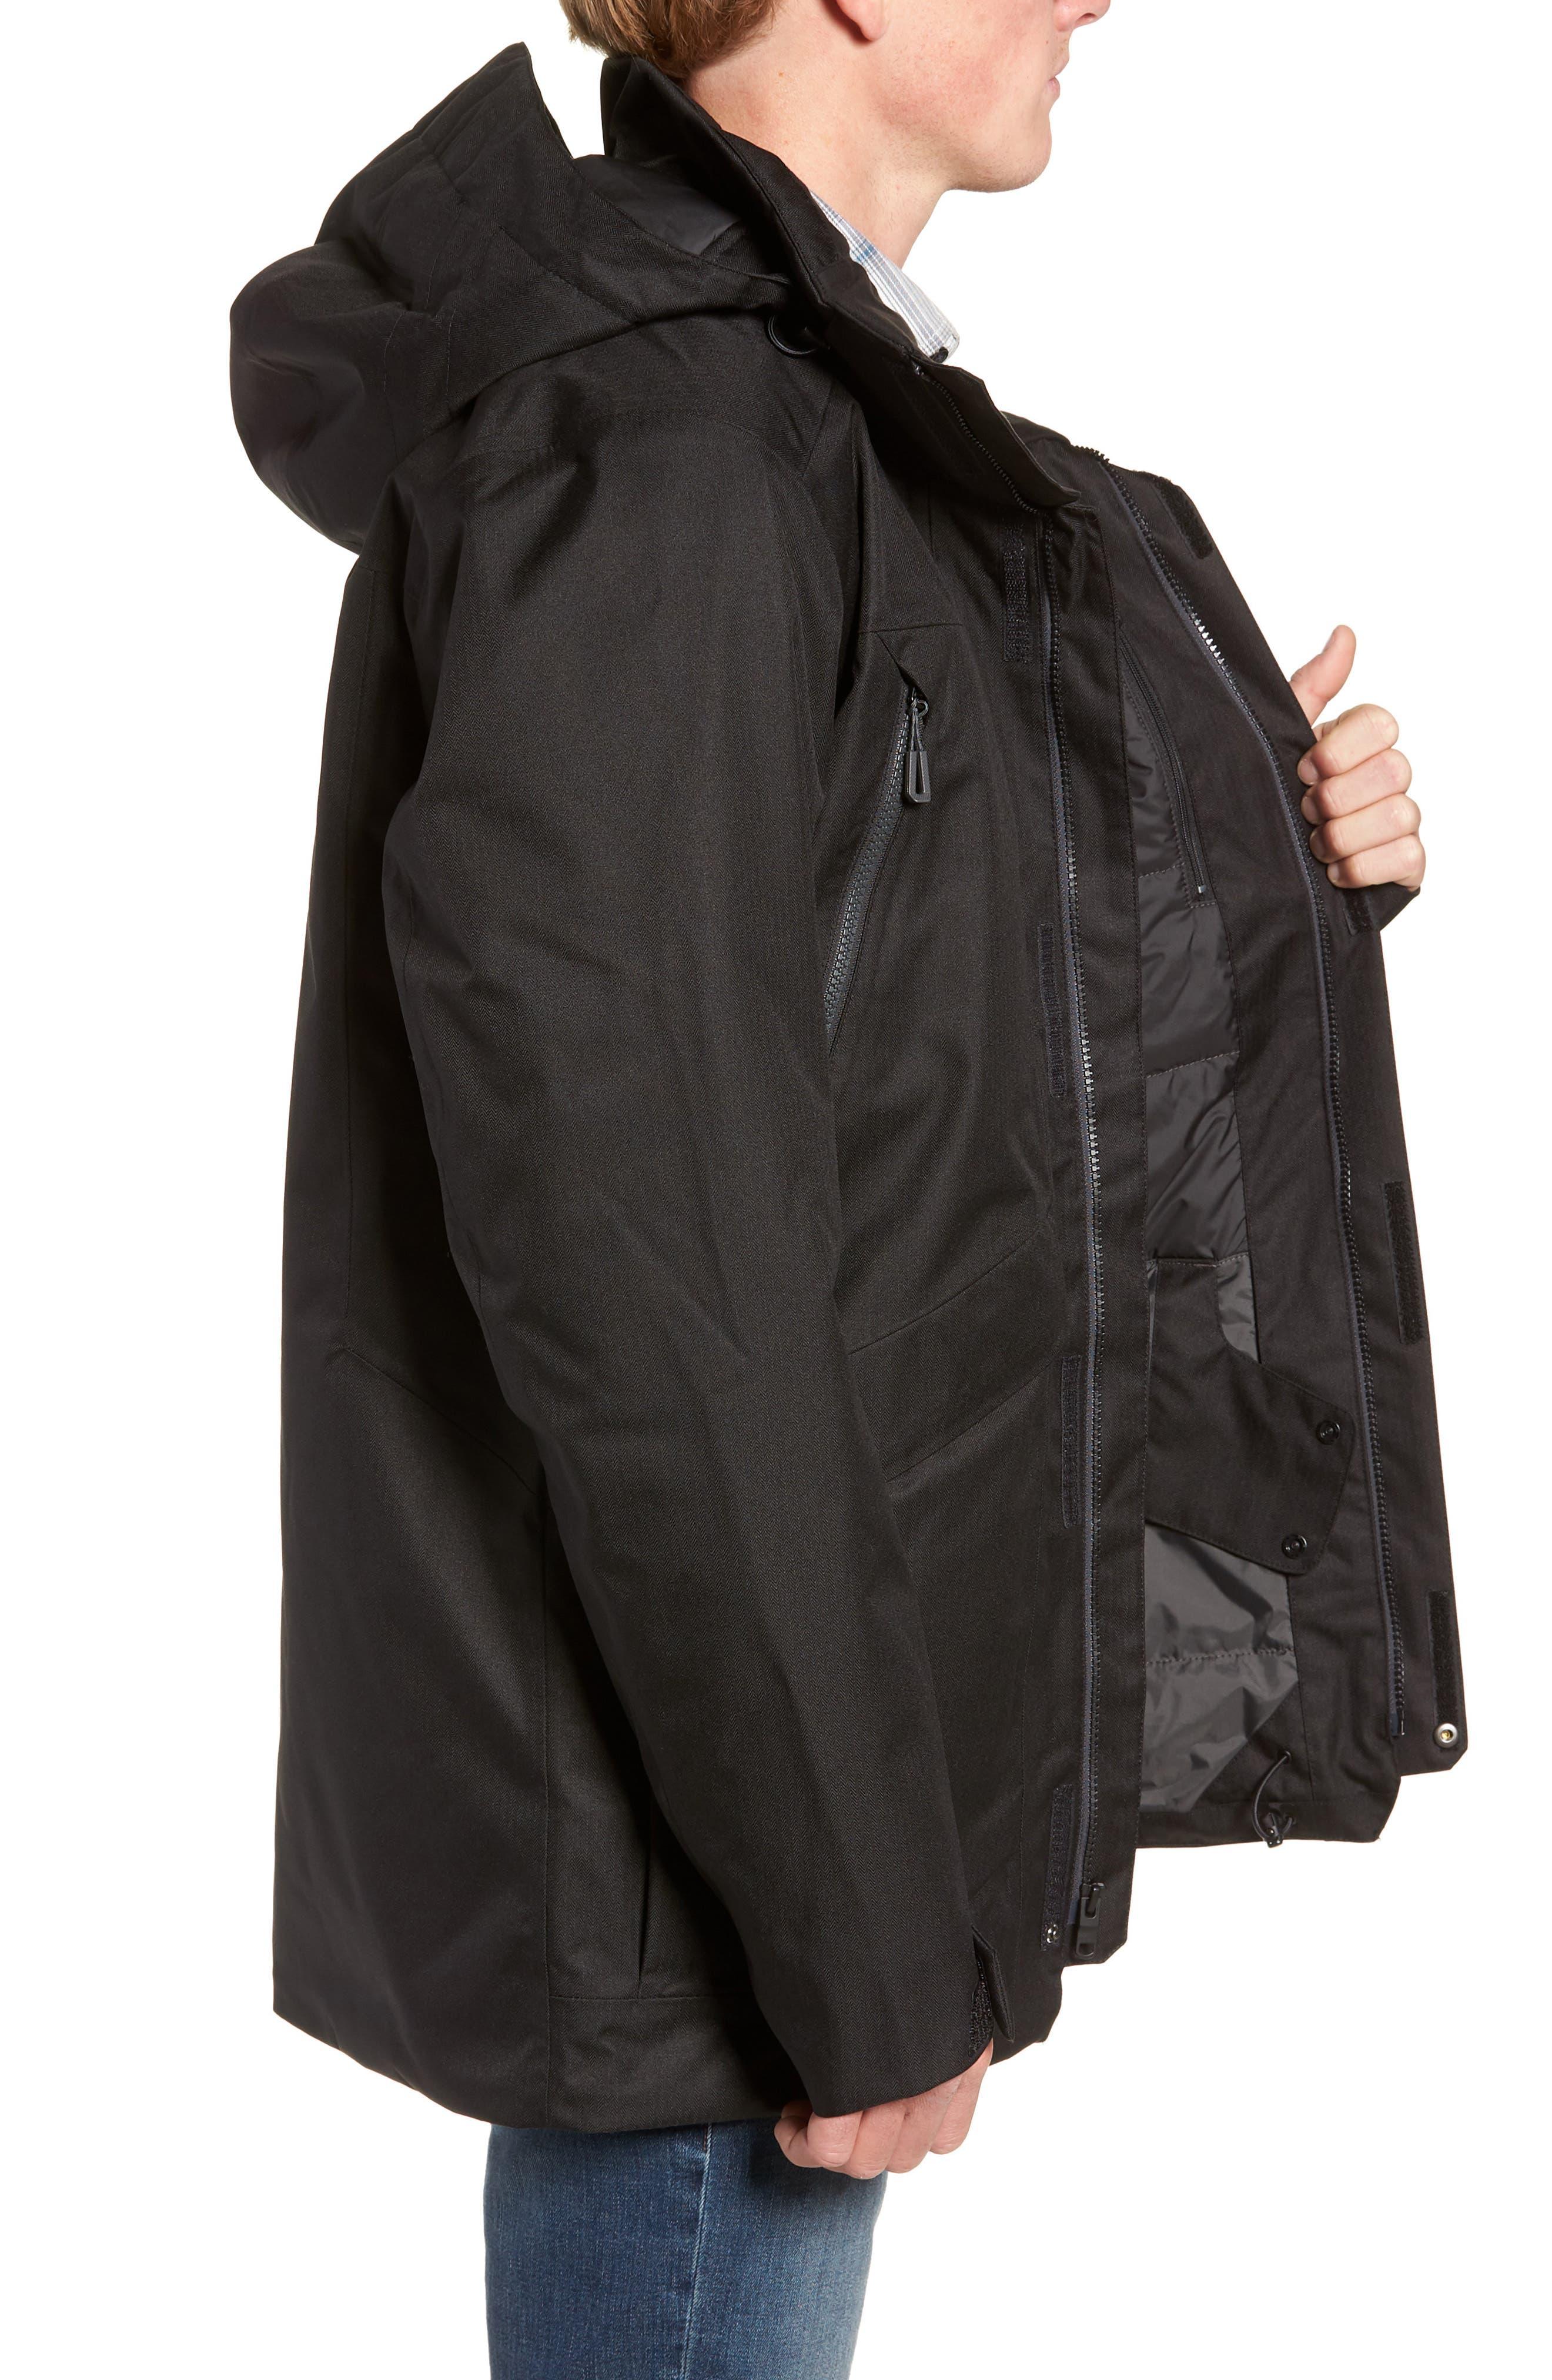 Gatekeeper Waterproof Jacket,                             Alternate thumbnail 3, color,                             TNF BLACK/TNF BLACK